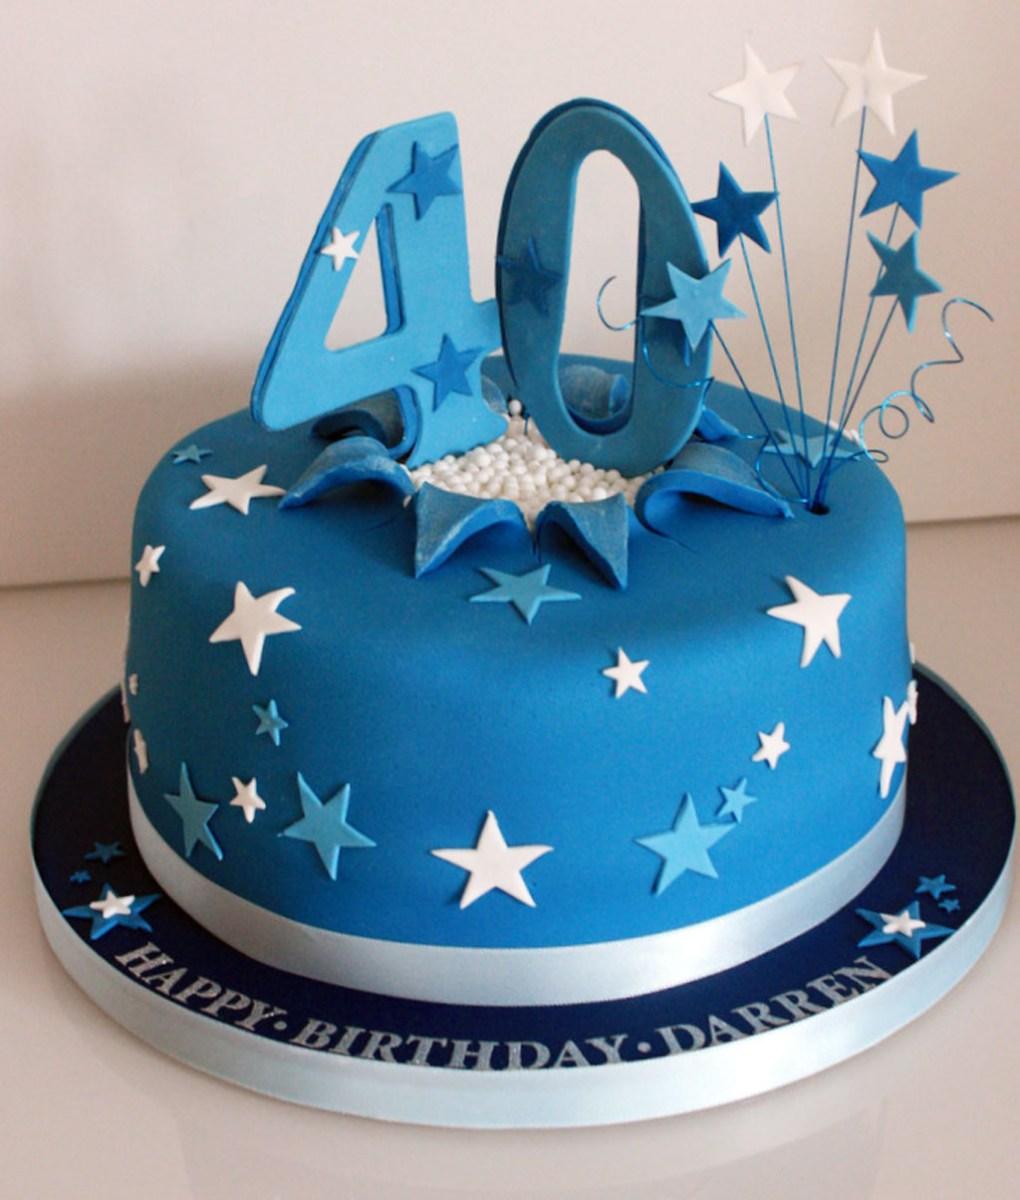 40Th Birthday Cake Ideas 10 Funny 40th Birthday Cakes Ideas Photo Funny Birthday Cake